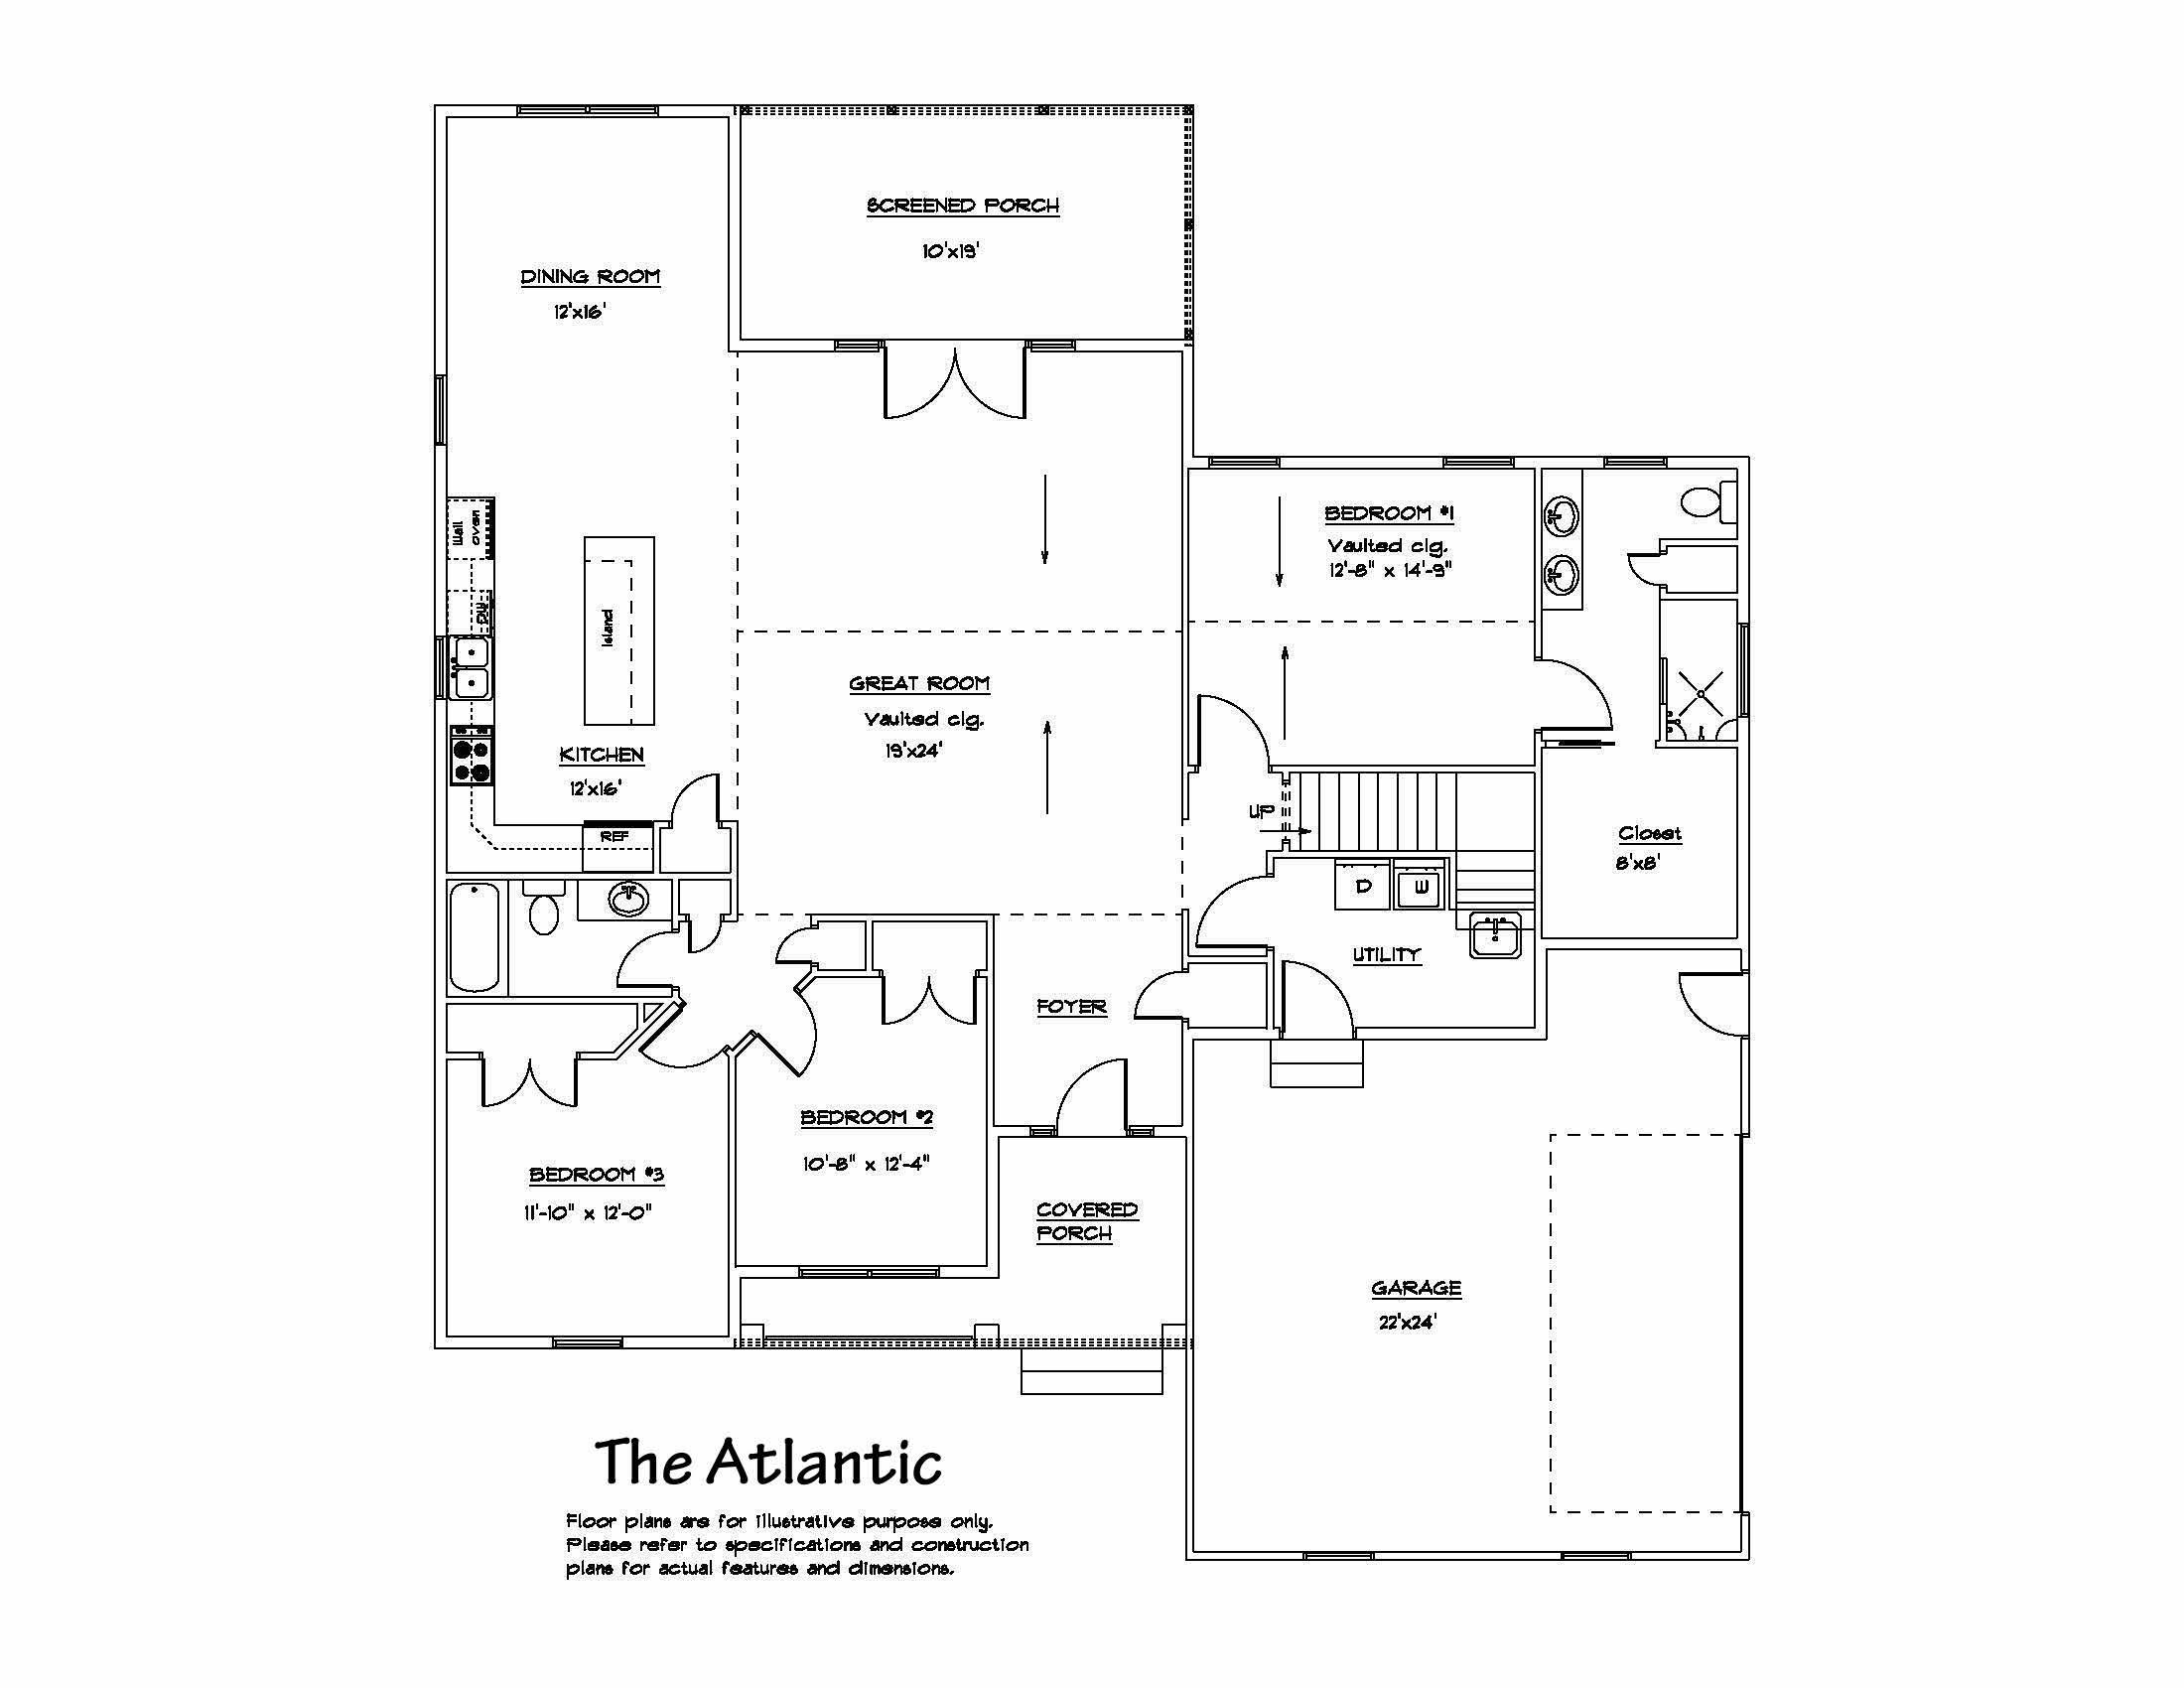 Fluharty Floor Plan brochure.jpg